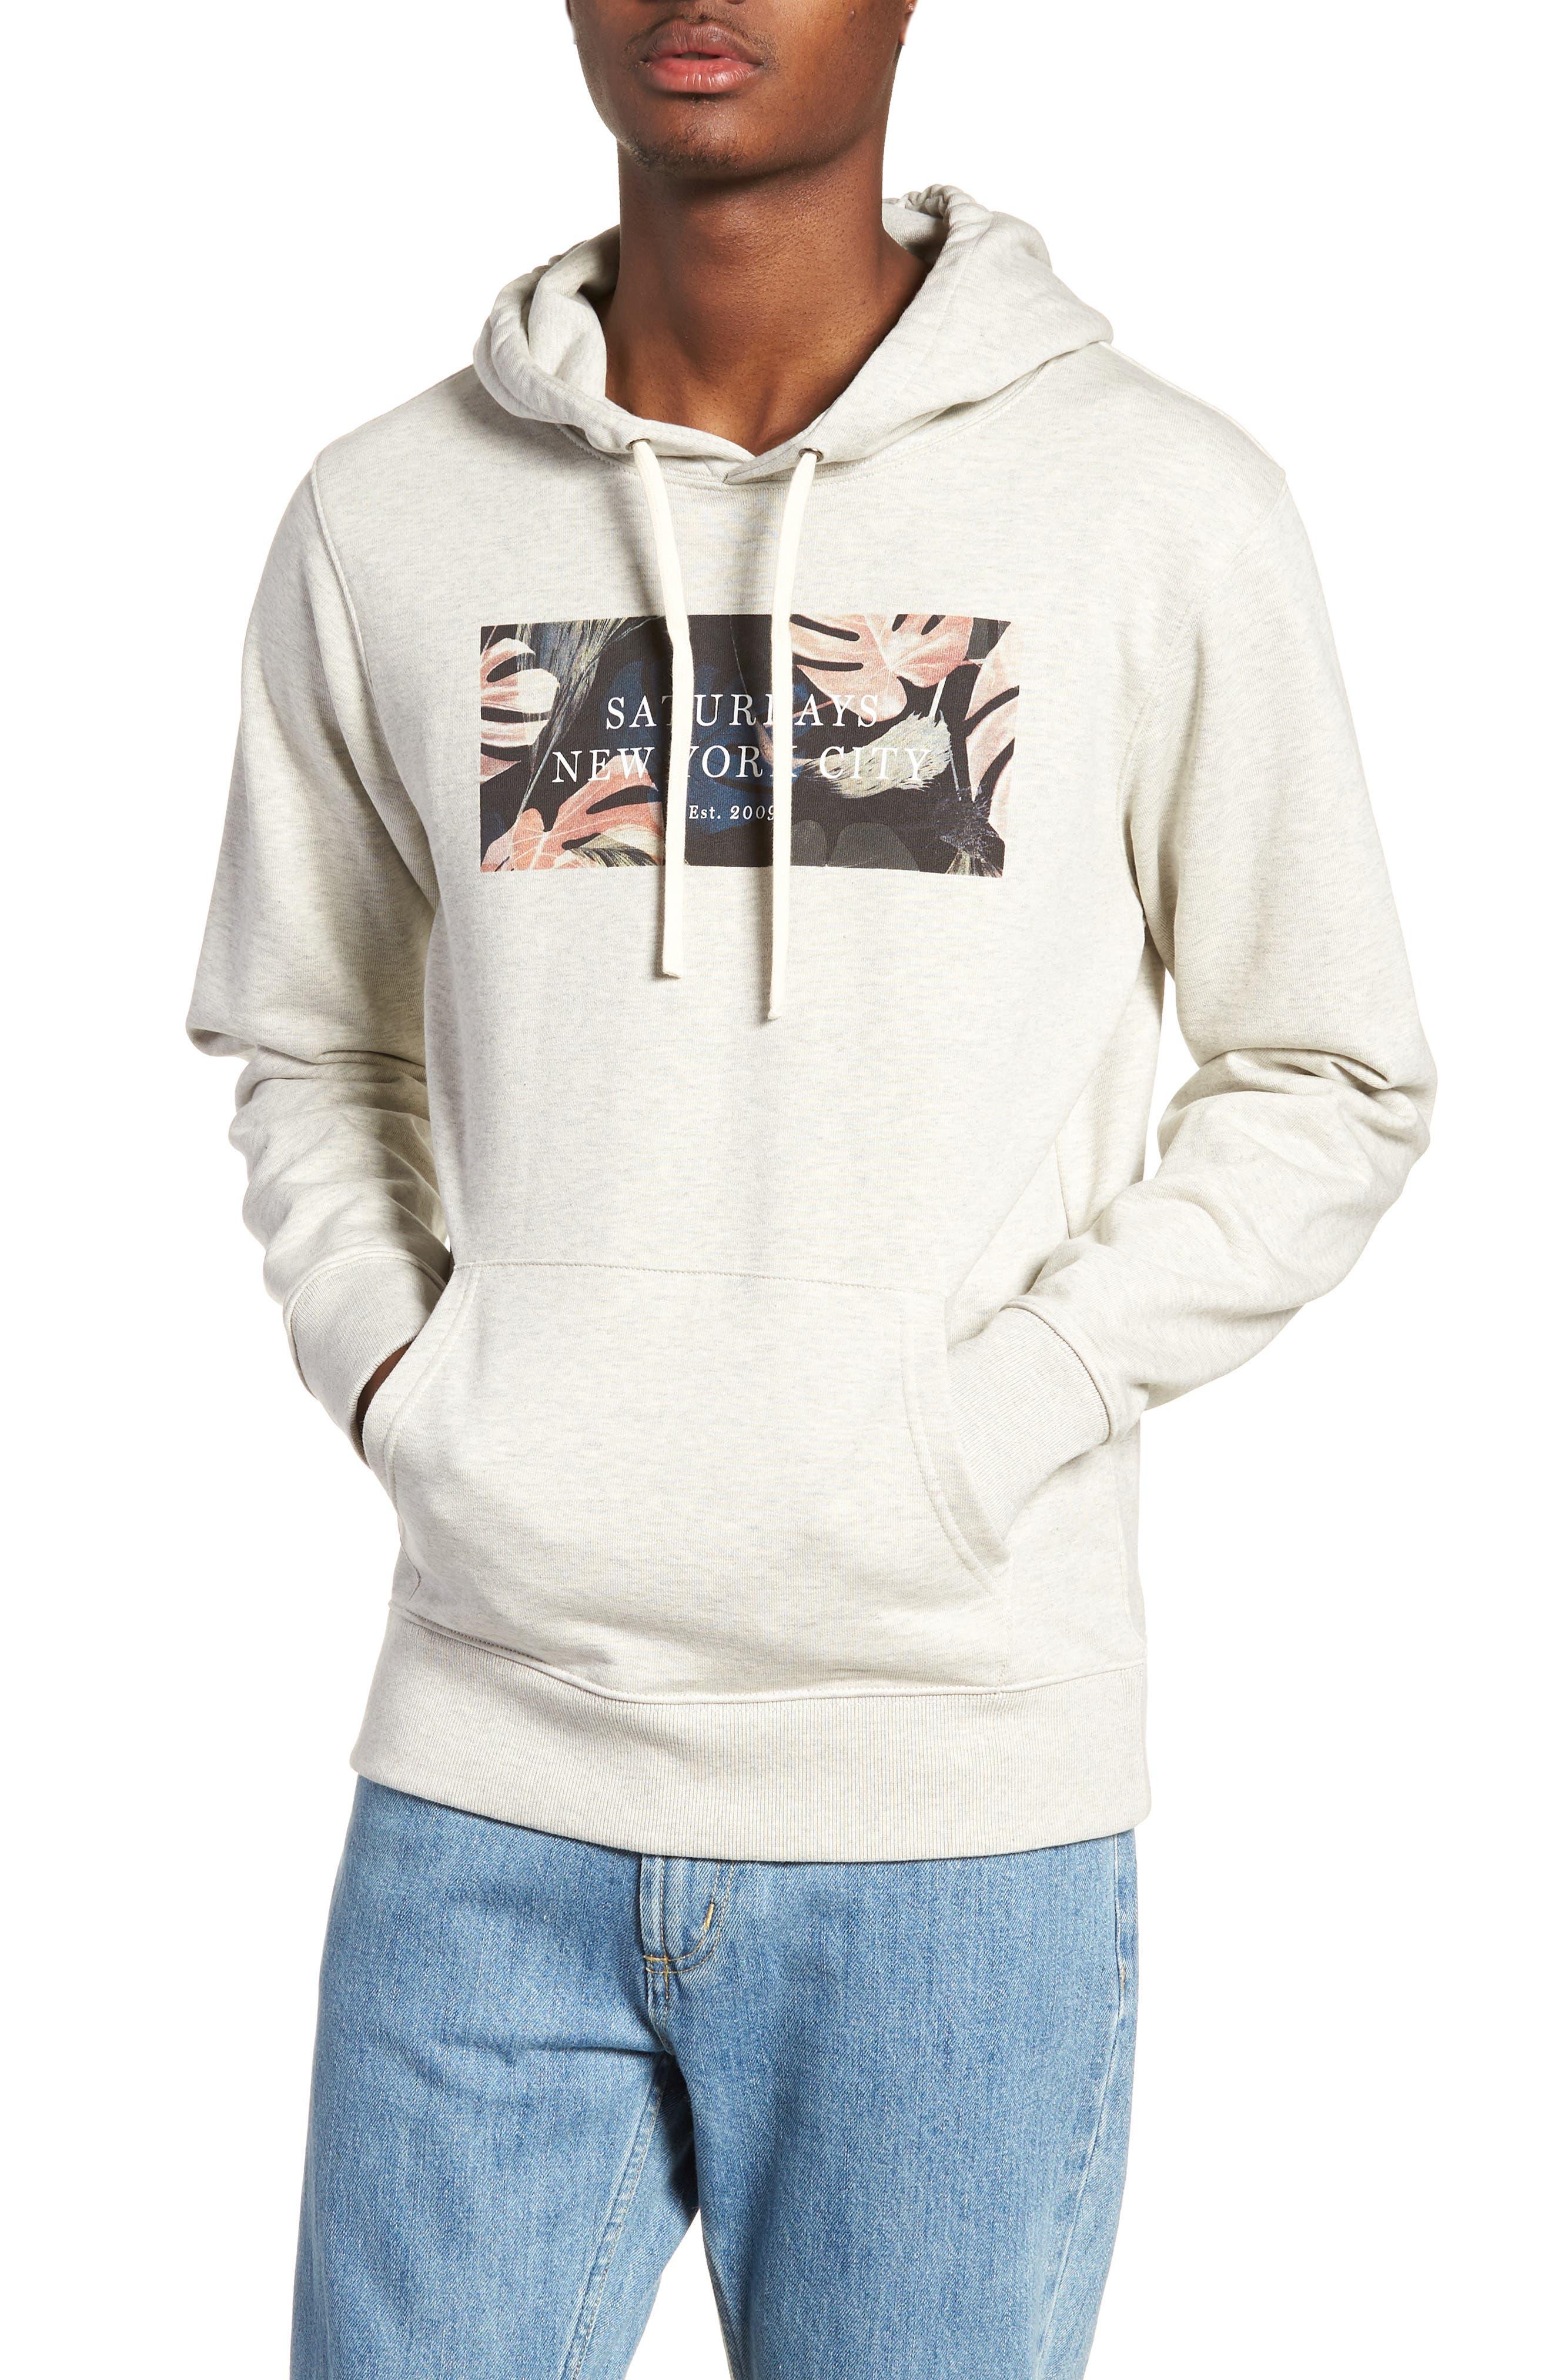 Ditch Monstera Block Hooded Sweatshirt,                             Main thumbnail 1, color,                             Natural Heater